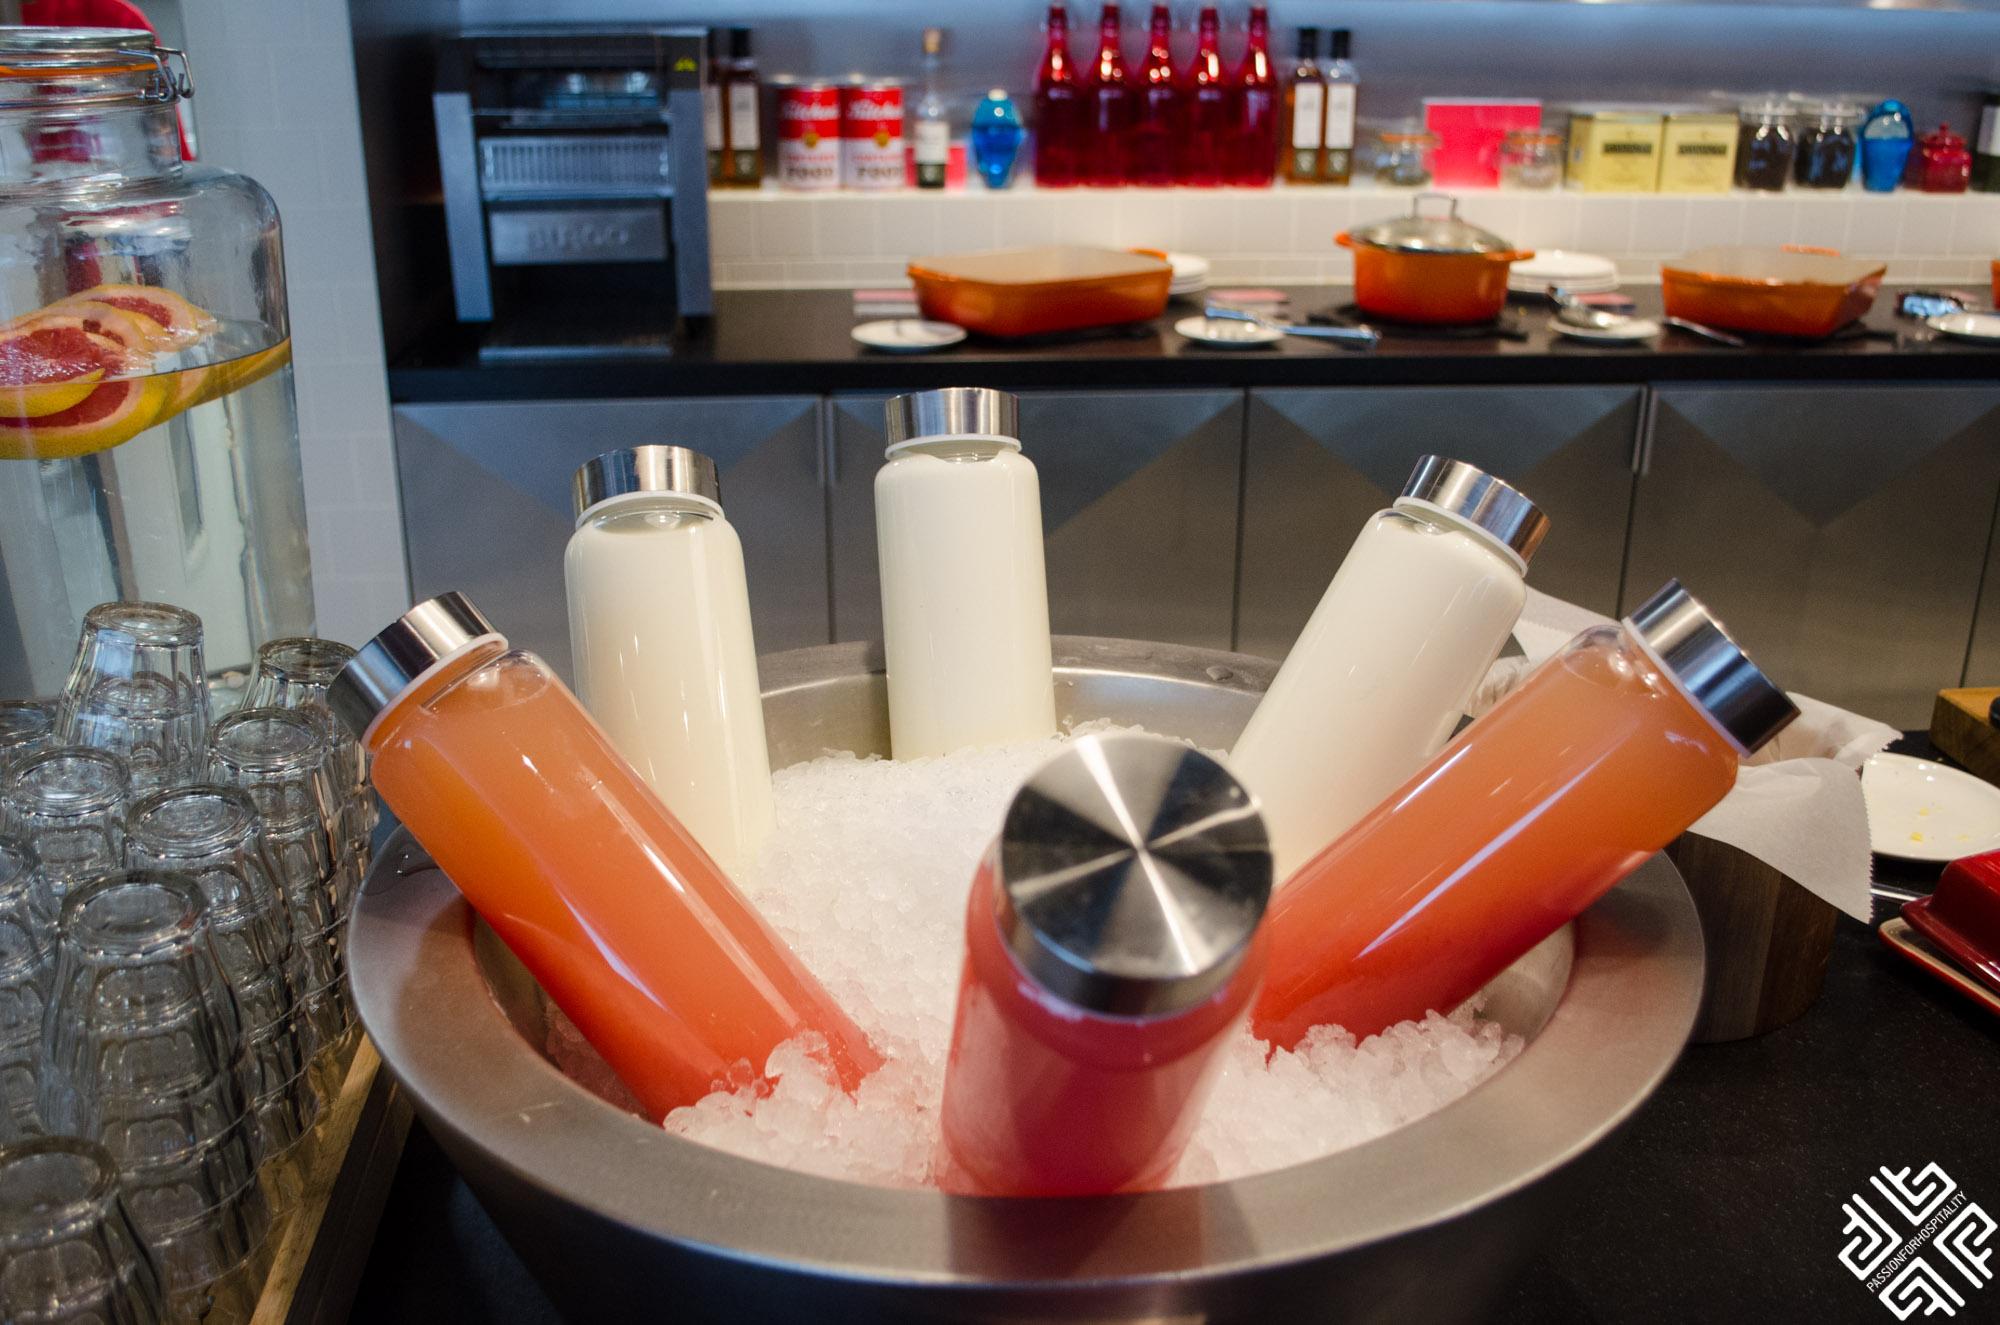 citizenM London Shoreditch hotel: The future of hospitality